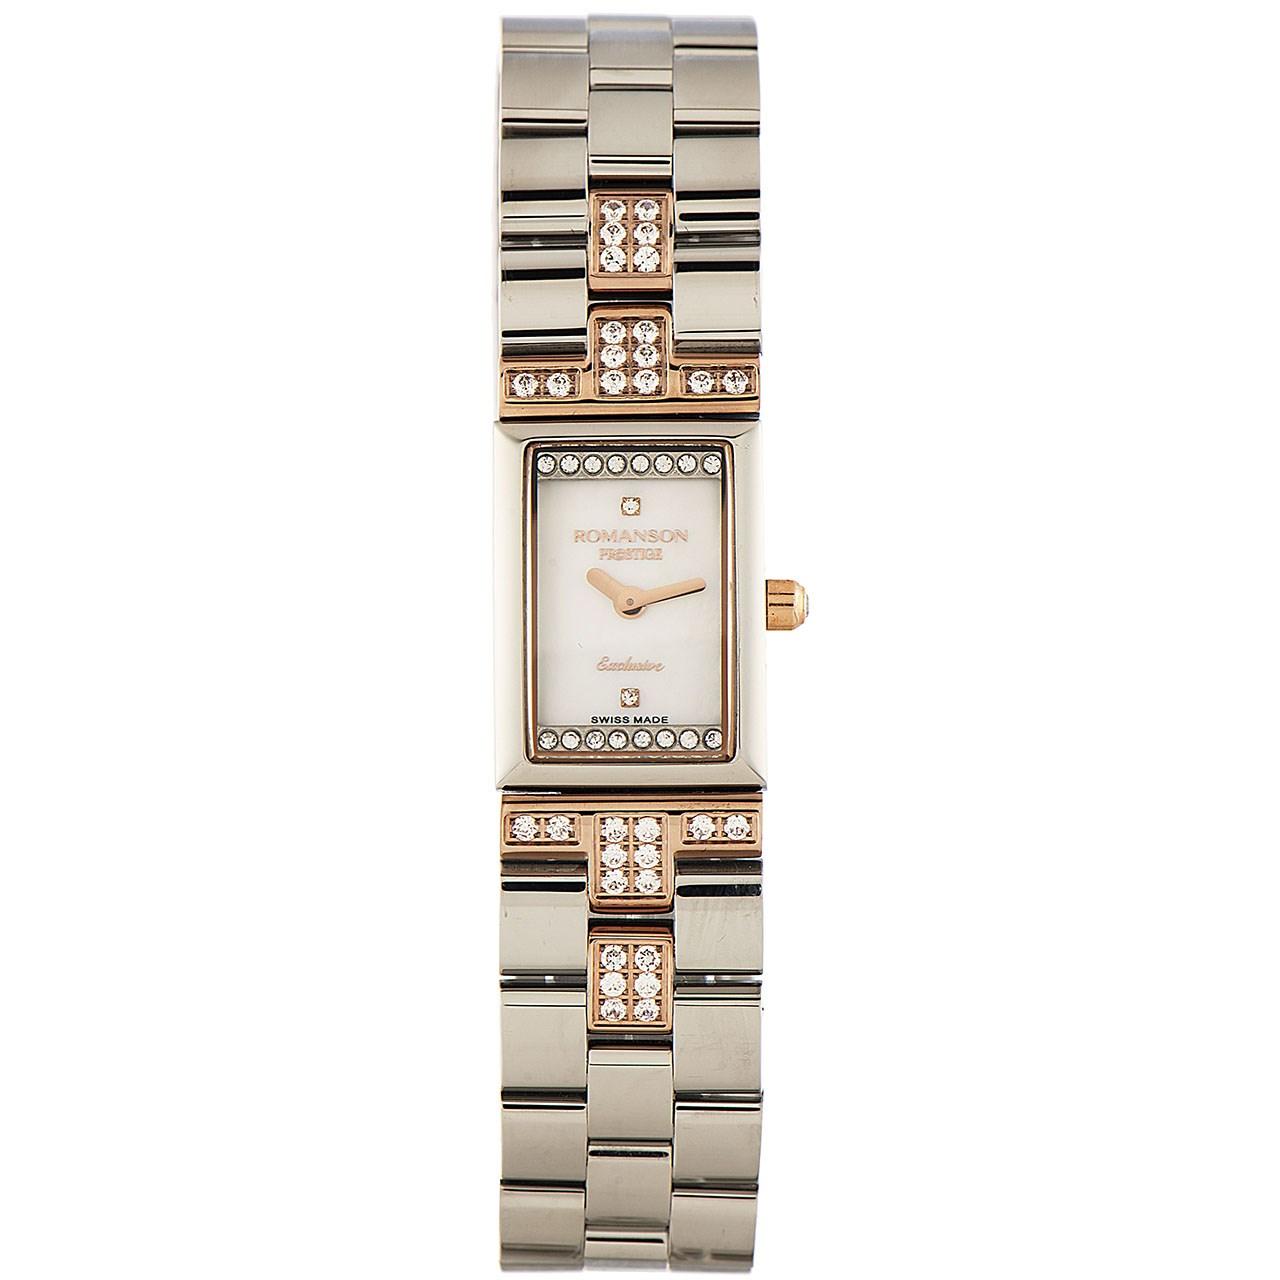 ساعت مچی عقربه ای زنانه رومانسون مدل RM3255CL1JM16R 14